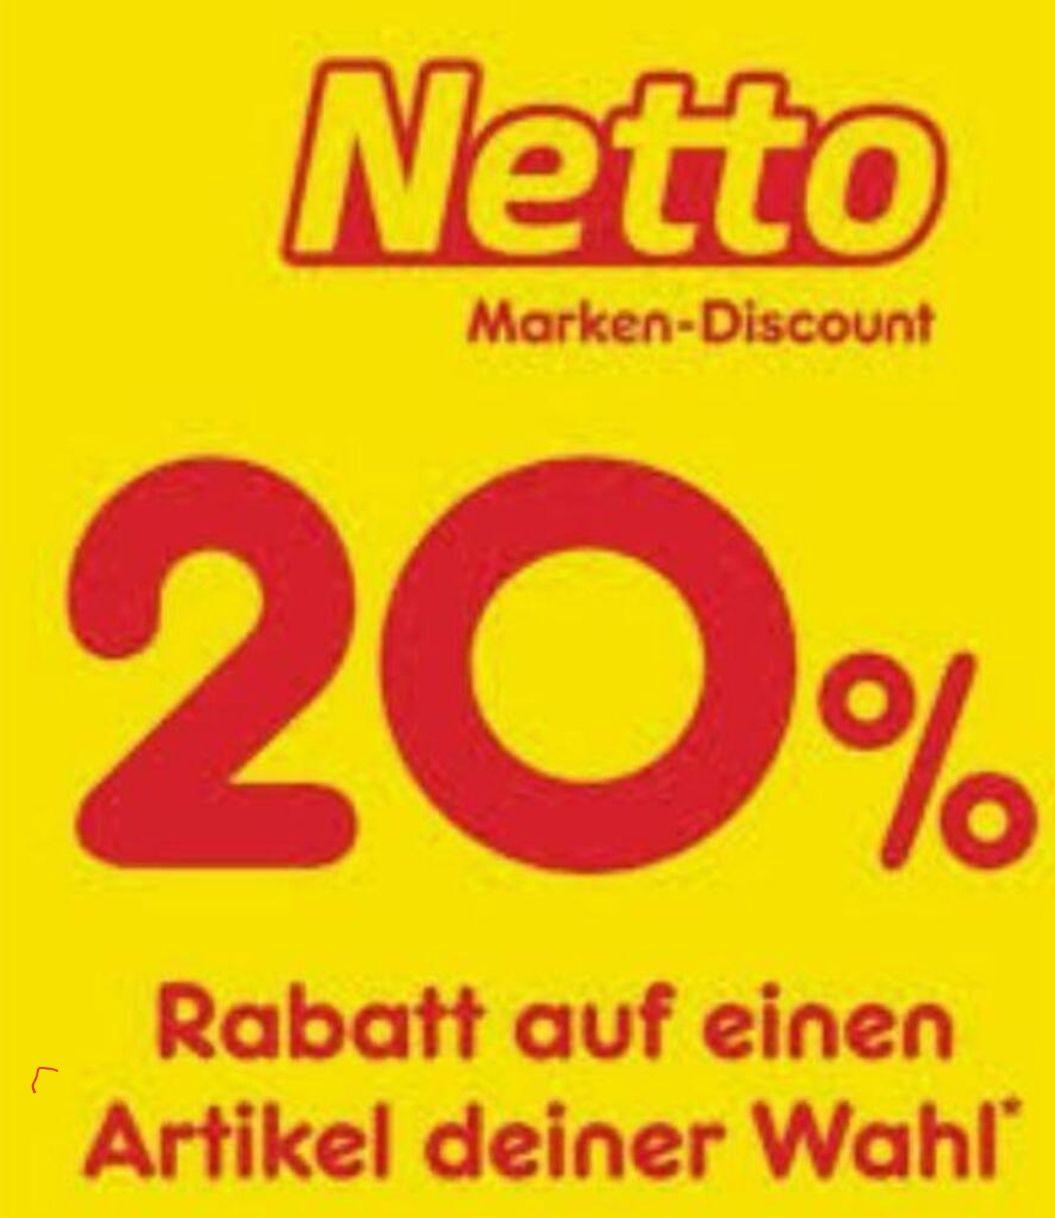 [Netto MD] Rabatt Coupons KW14 (06.04.-10.04.), bundesweit einsetzbar